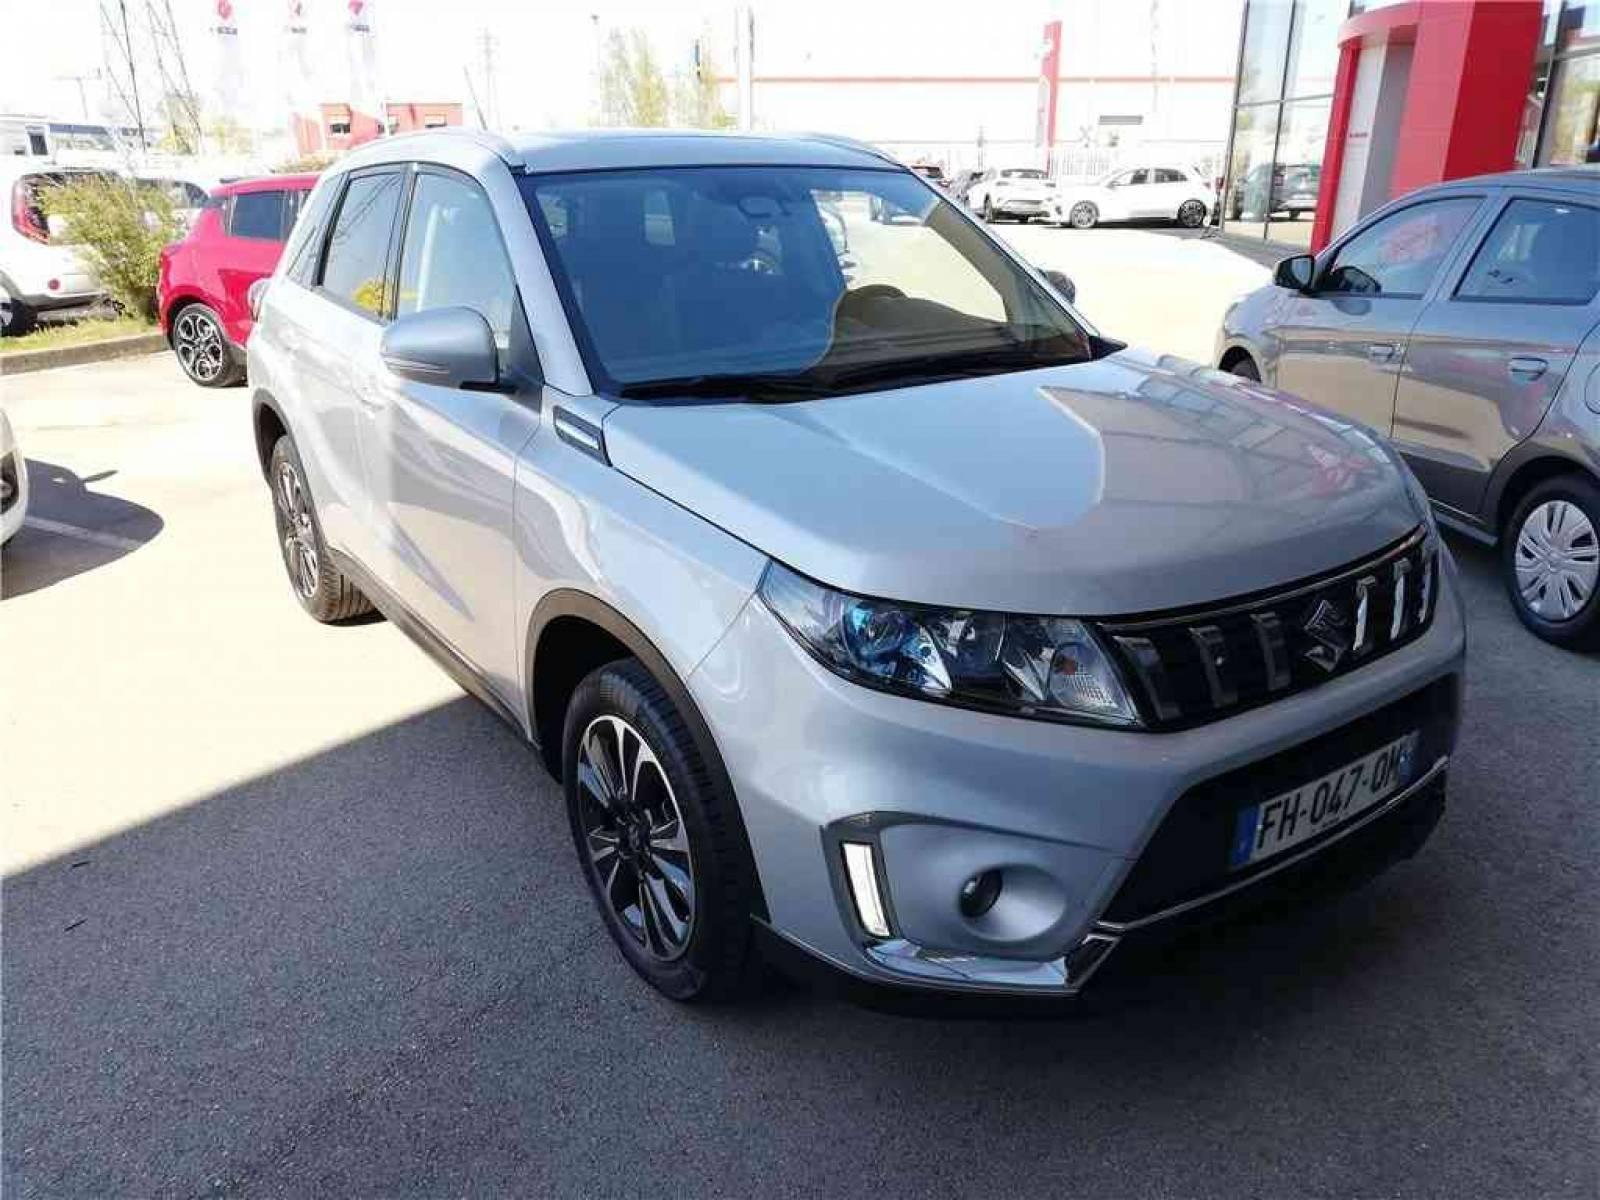 SUZUKI Vitara 1.0 Boosterjet - véhicule d'occasion - Groupe Guillet - Opel Magicauto - Chalon-sur-Saône - 71380 - Saint-Marcel - 35